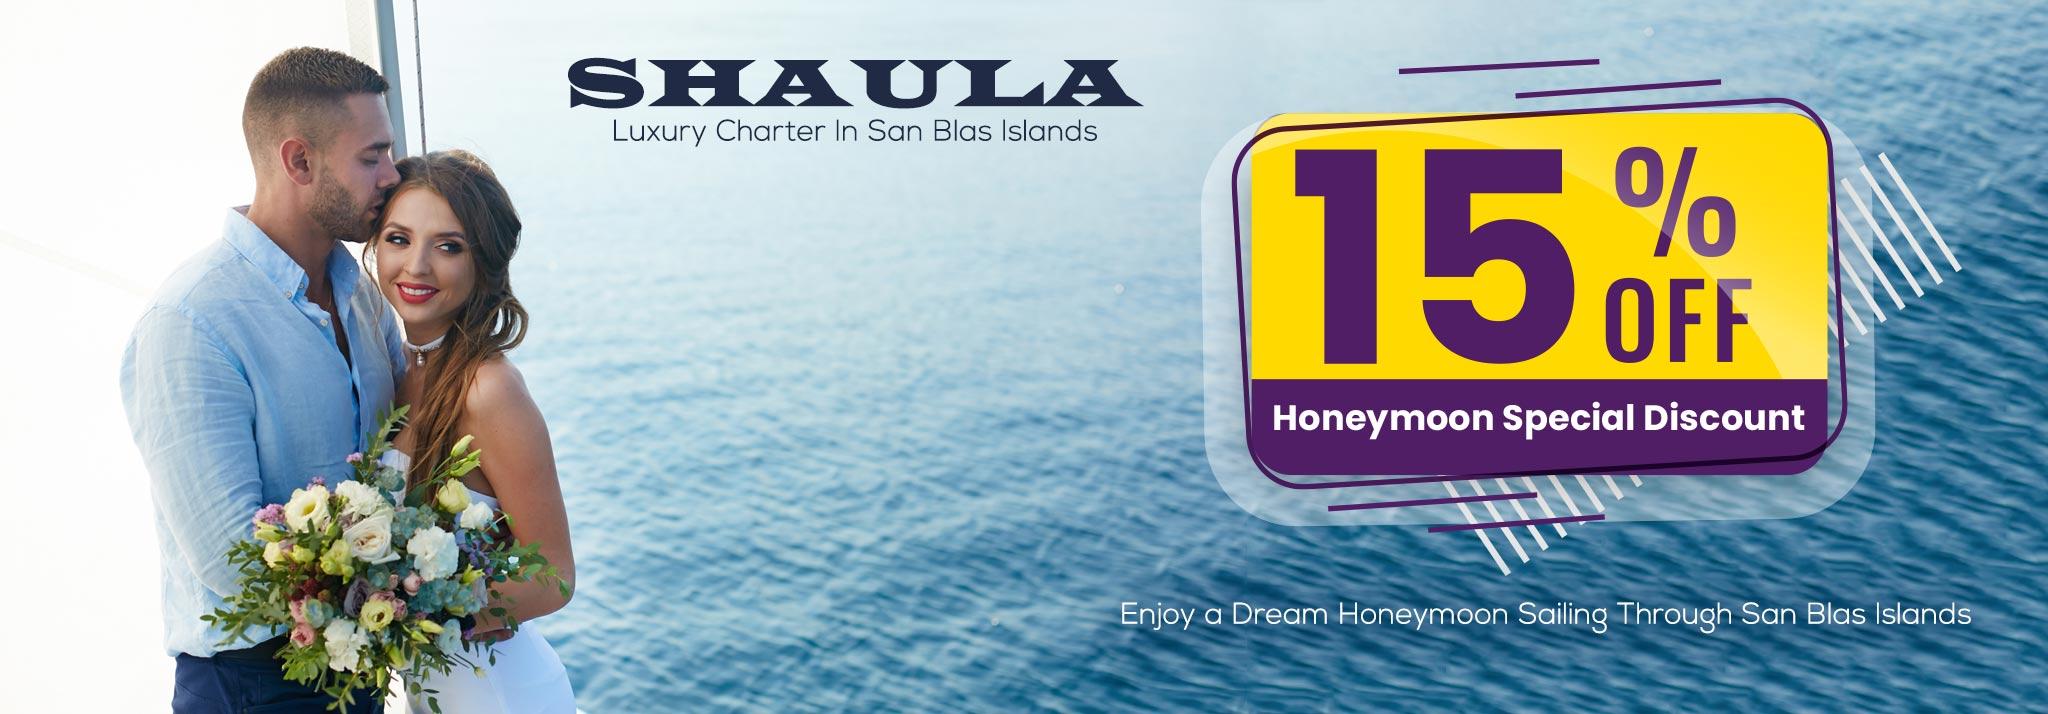 Honeymoon Special Discount Shaula Luxury Charter In San Blas Islands